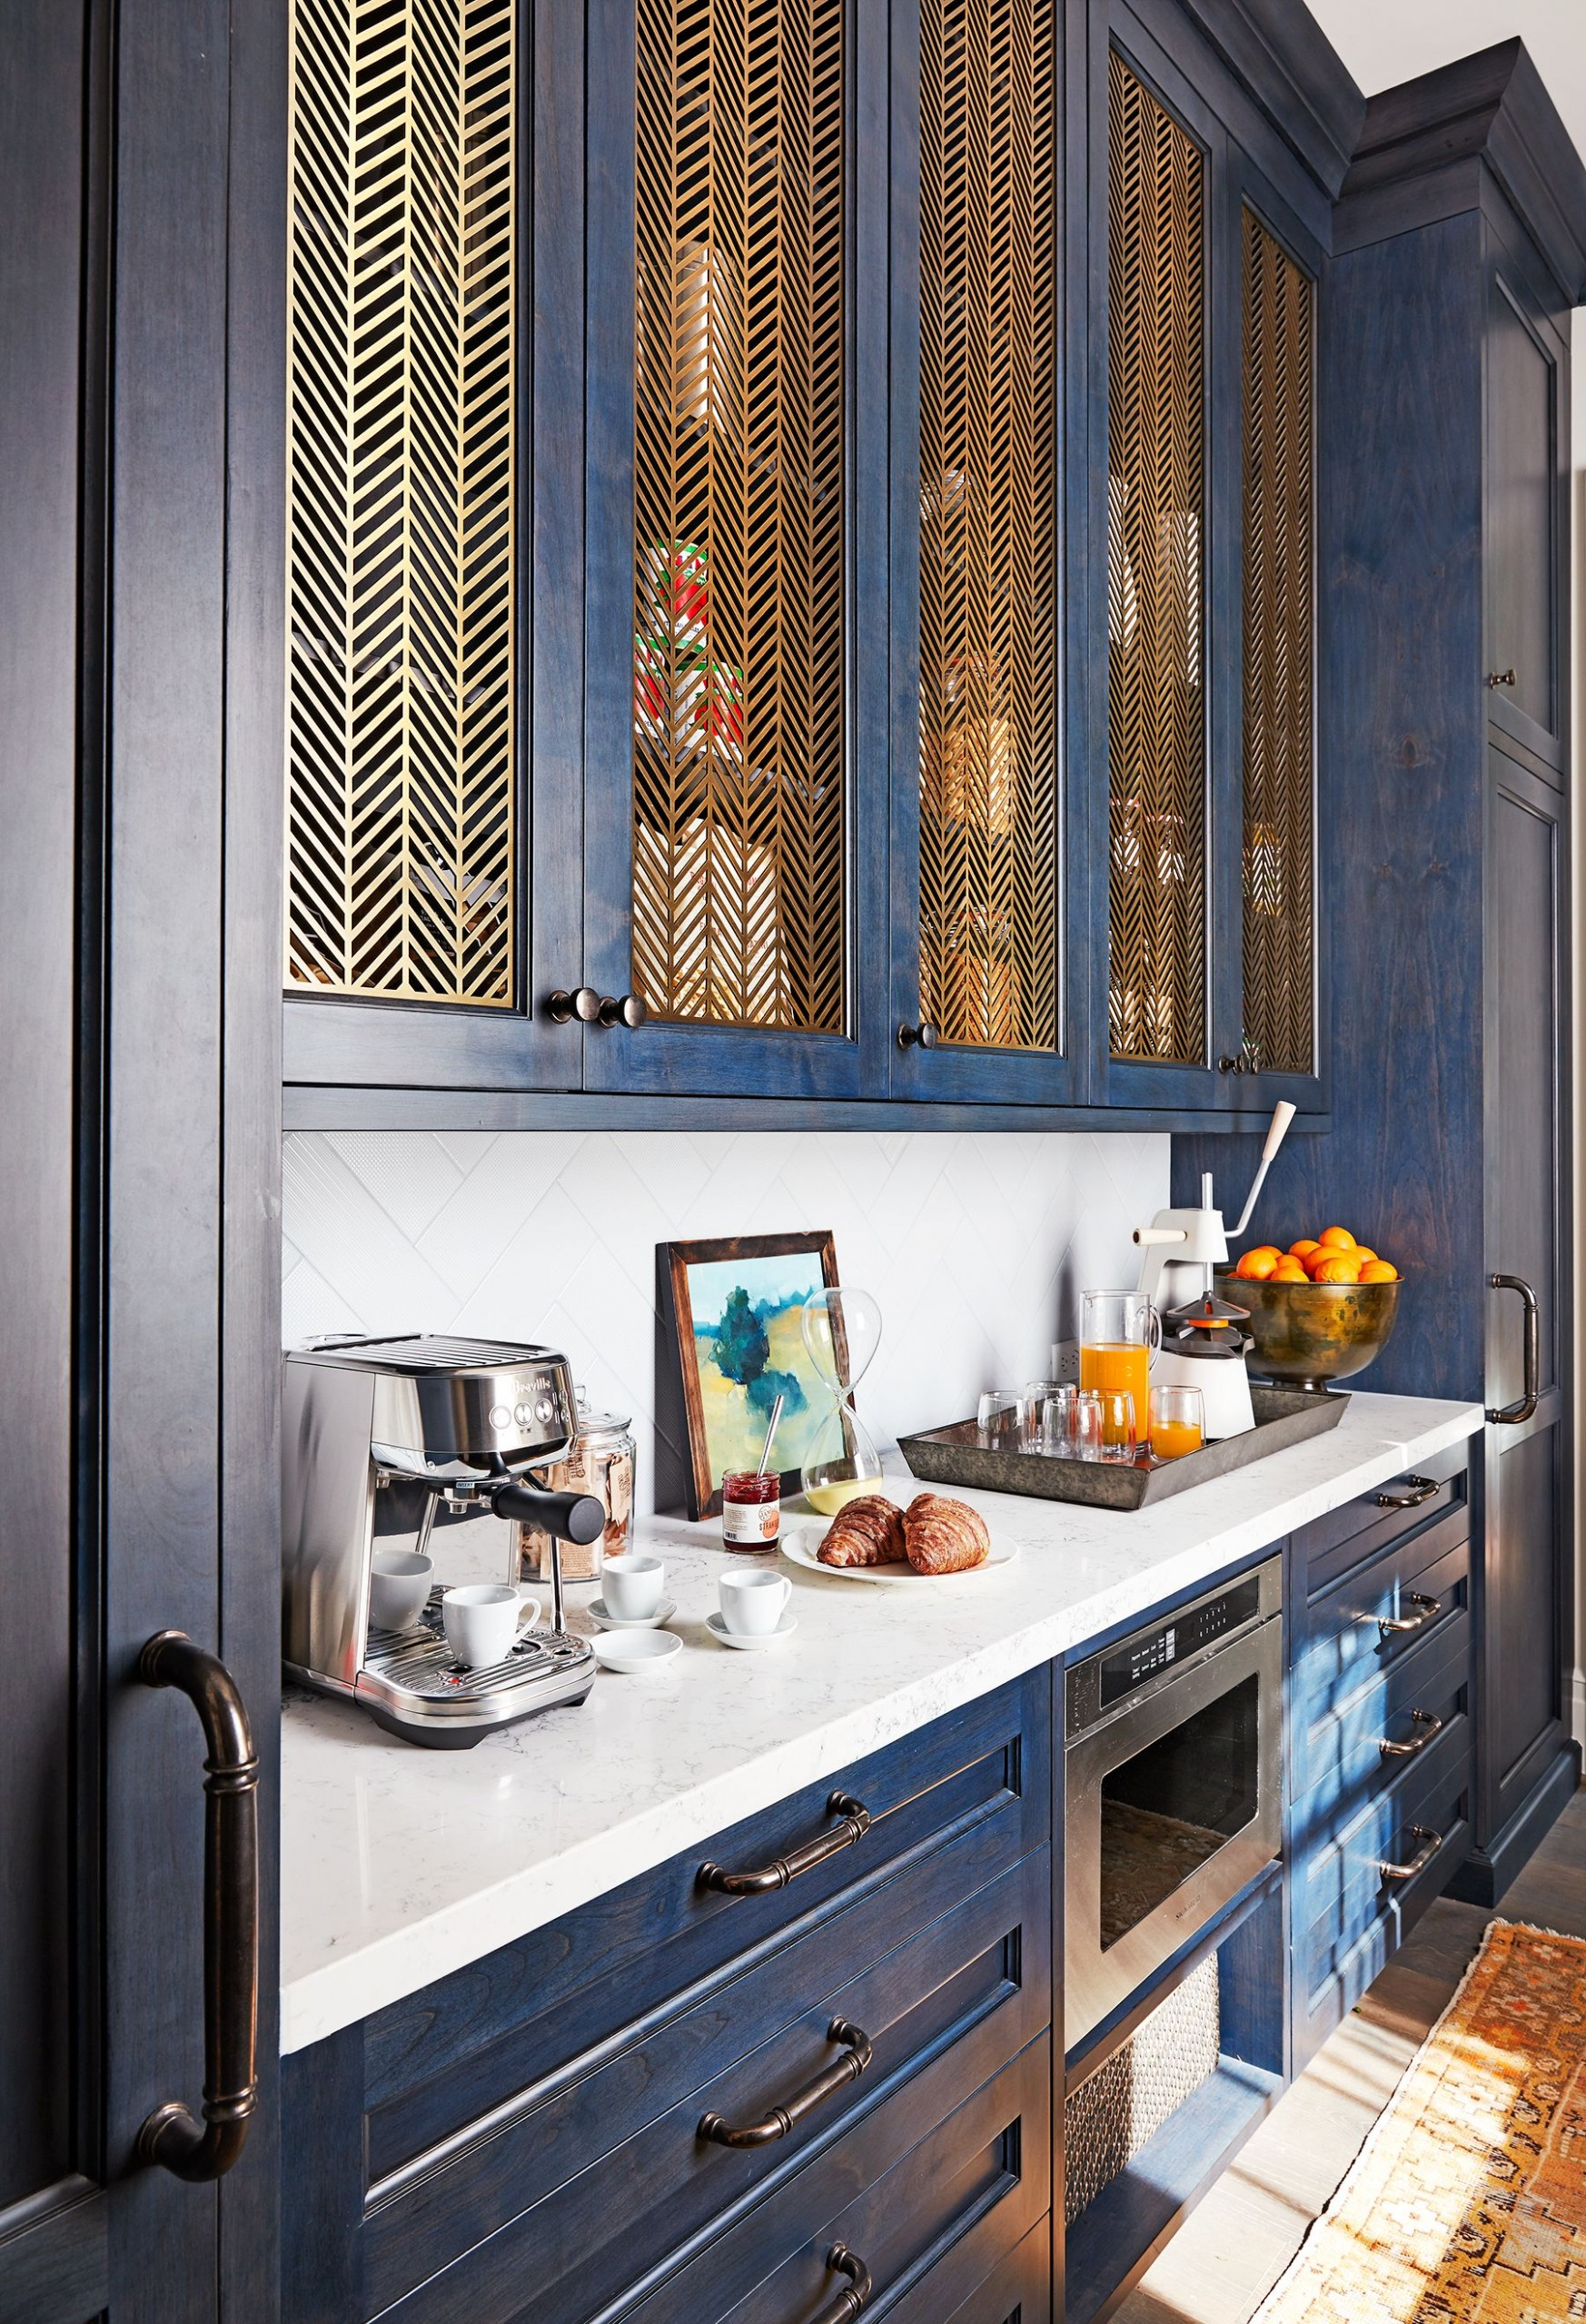 12 Kitchen Cabinet Design Ideas 12 - Unique Kitchen Cabinet Styles - Two Different Style Kitchen Cabinets